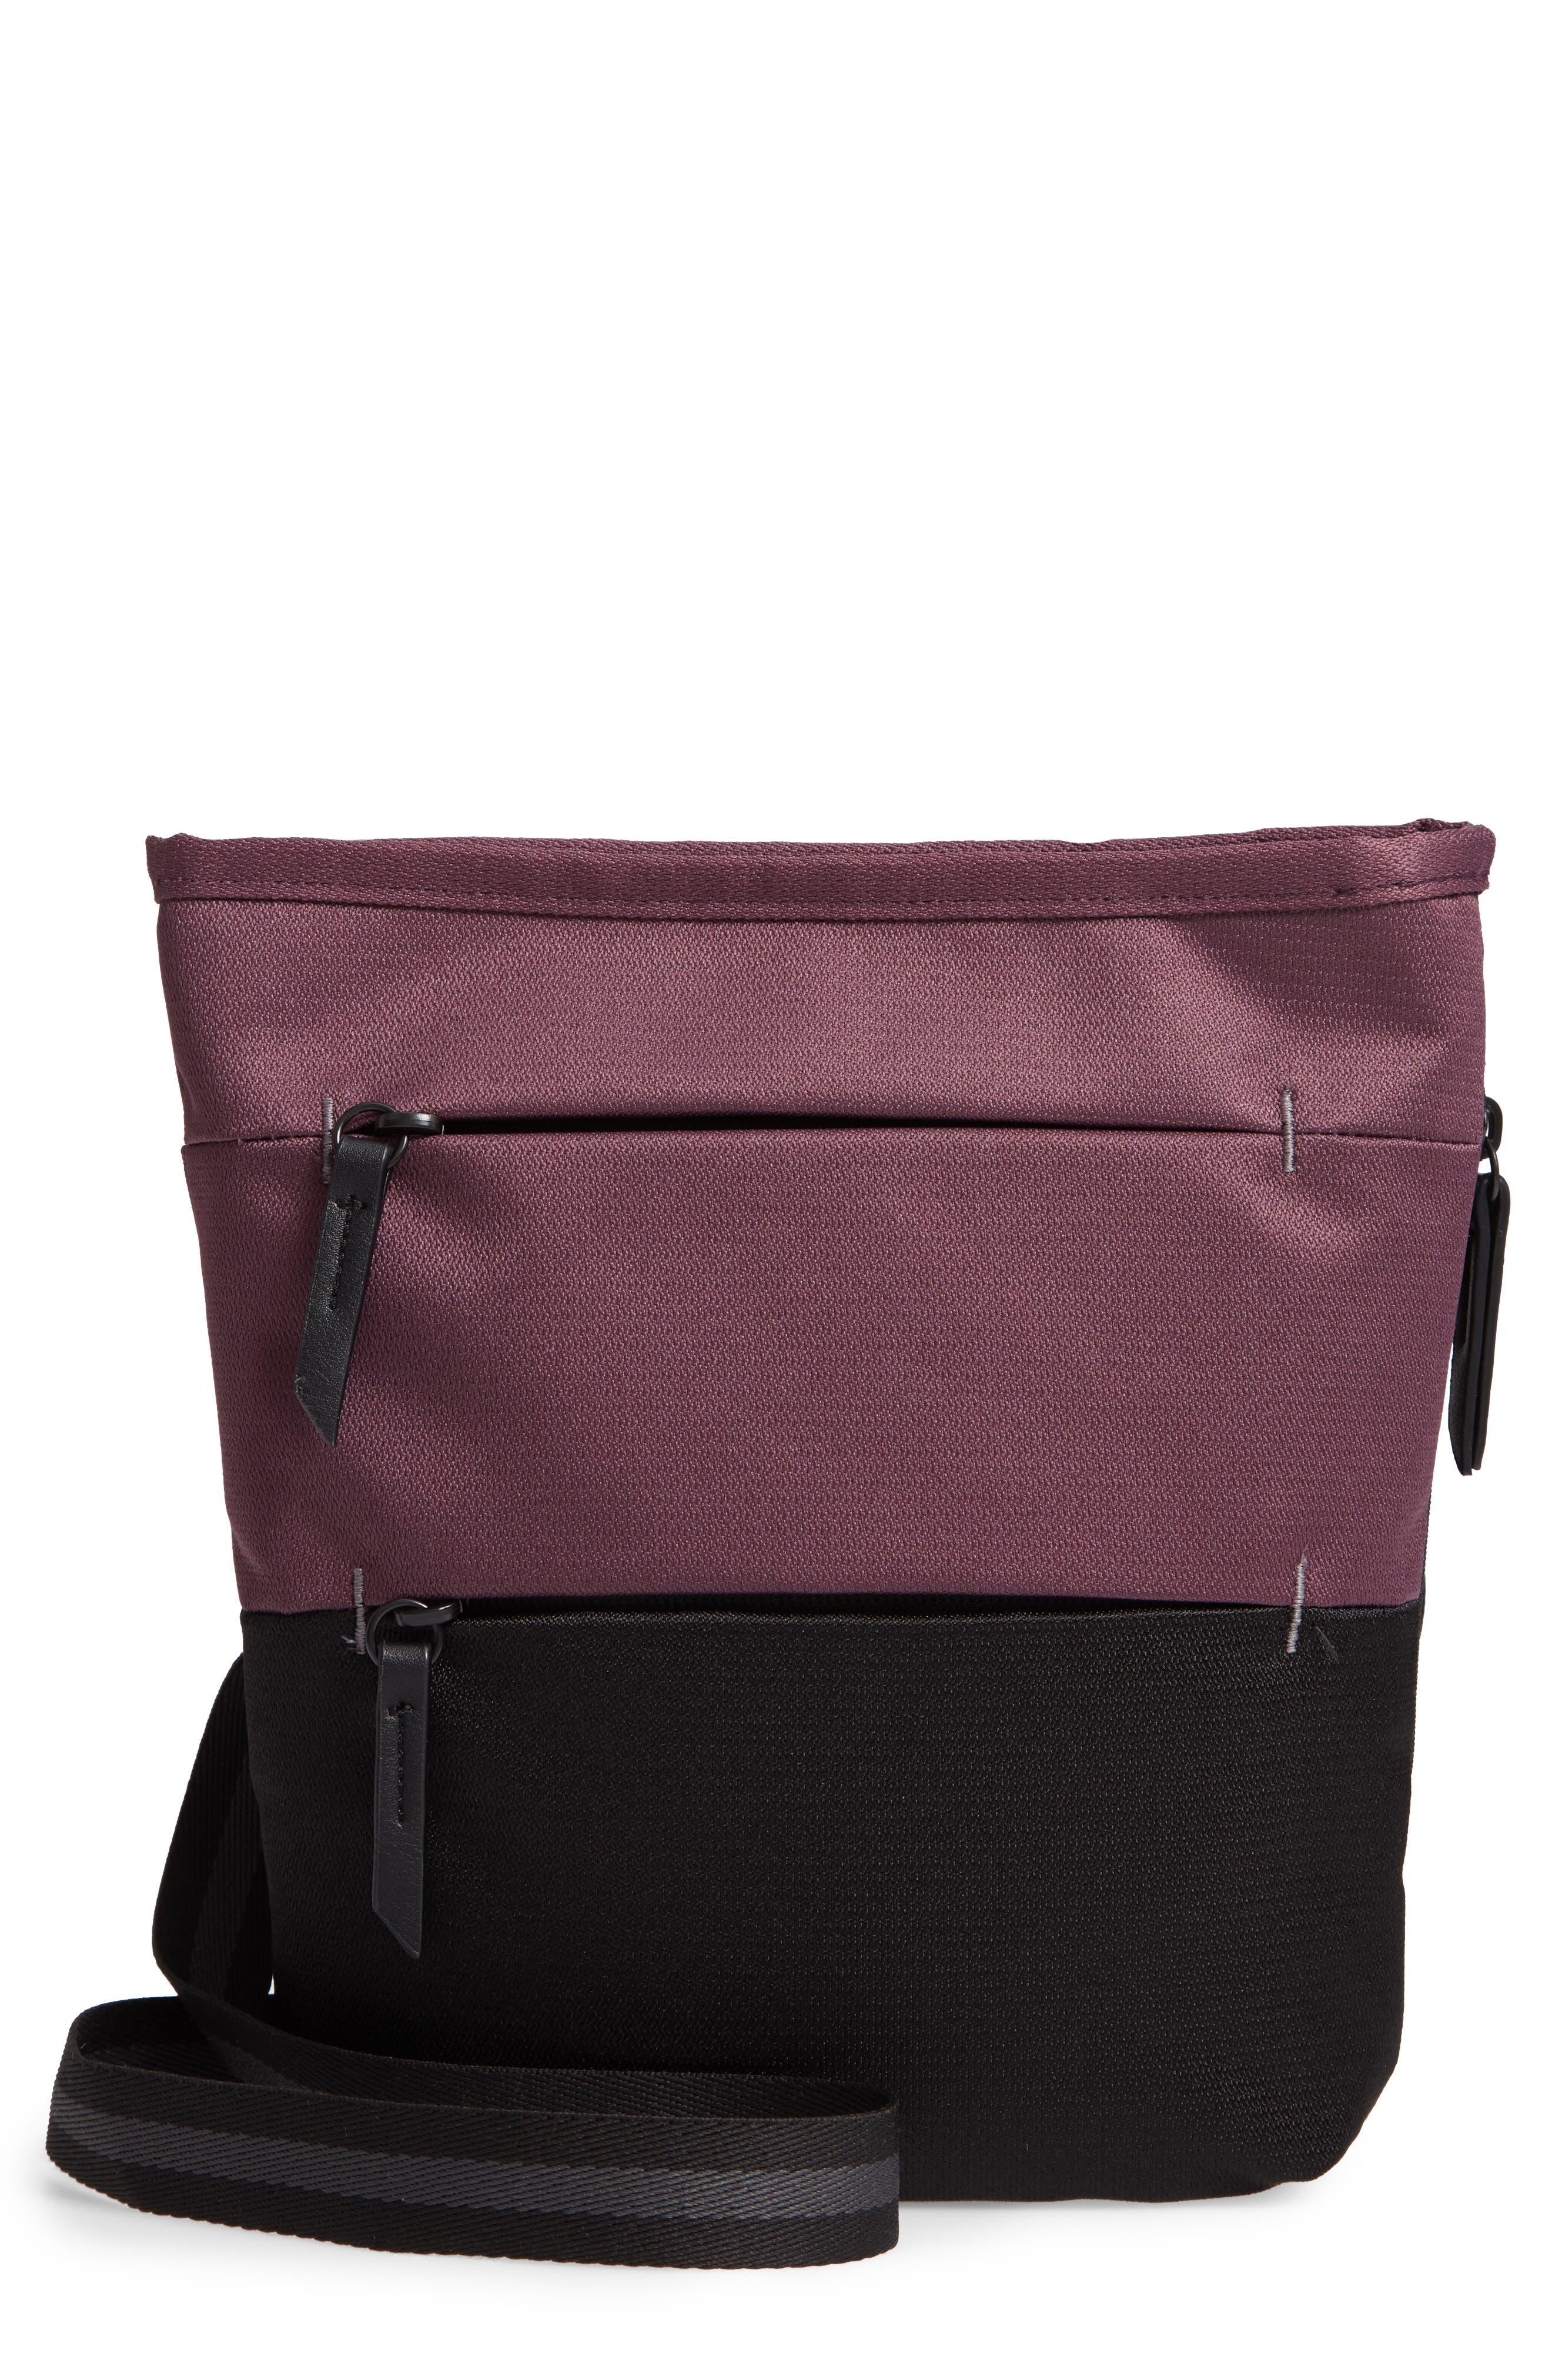 Sadie Medium RFID Crossbody Bag,                         Main,                         color, PURPLE DAHLIA/ BLACK